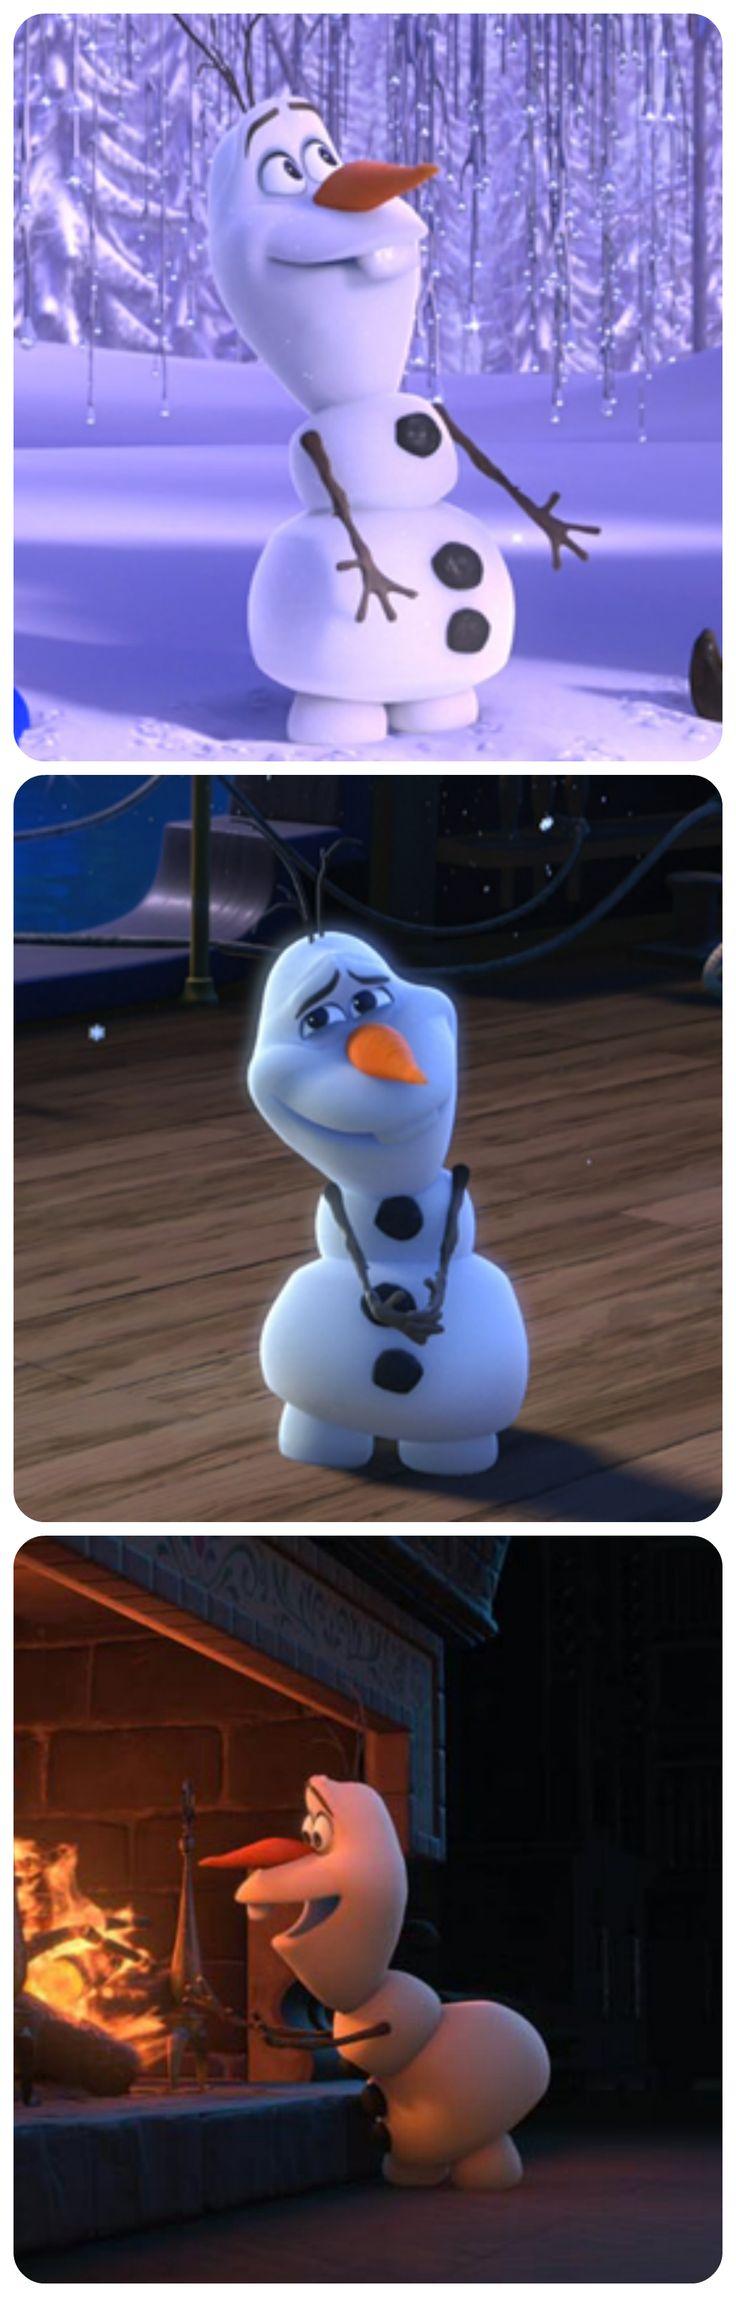 We'd love to share a warm hug with Olaf.